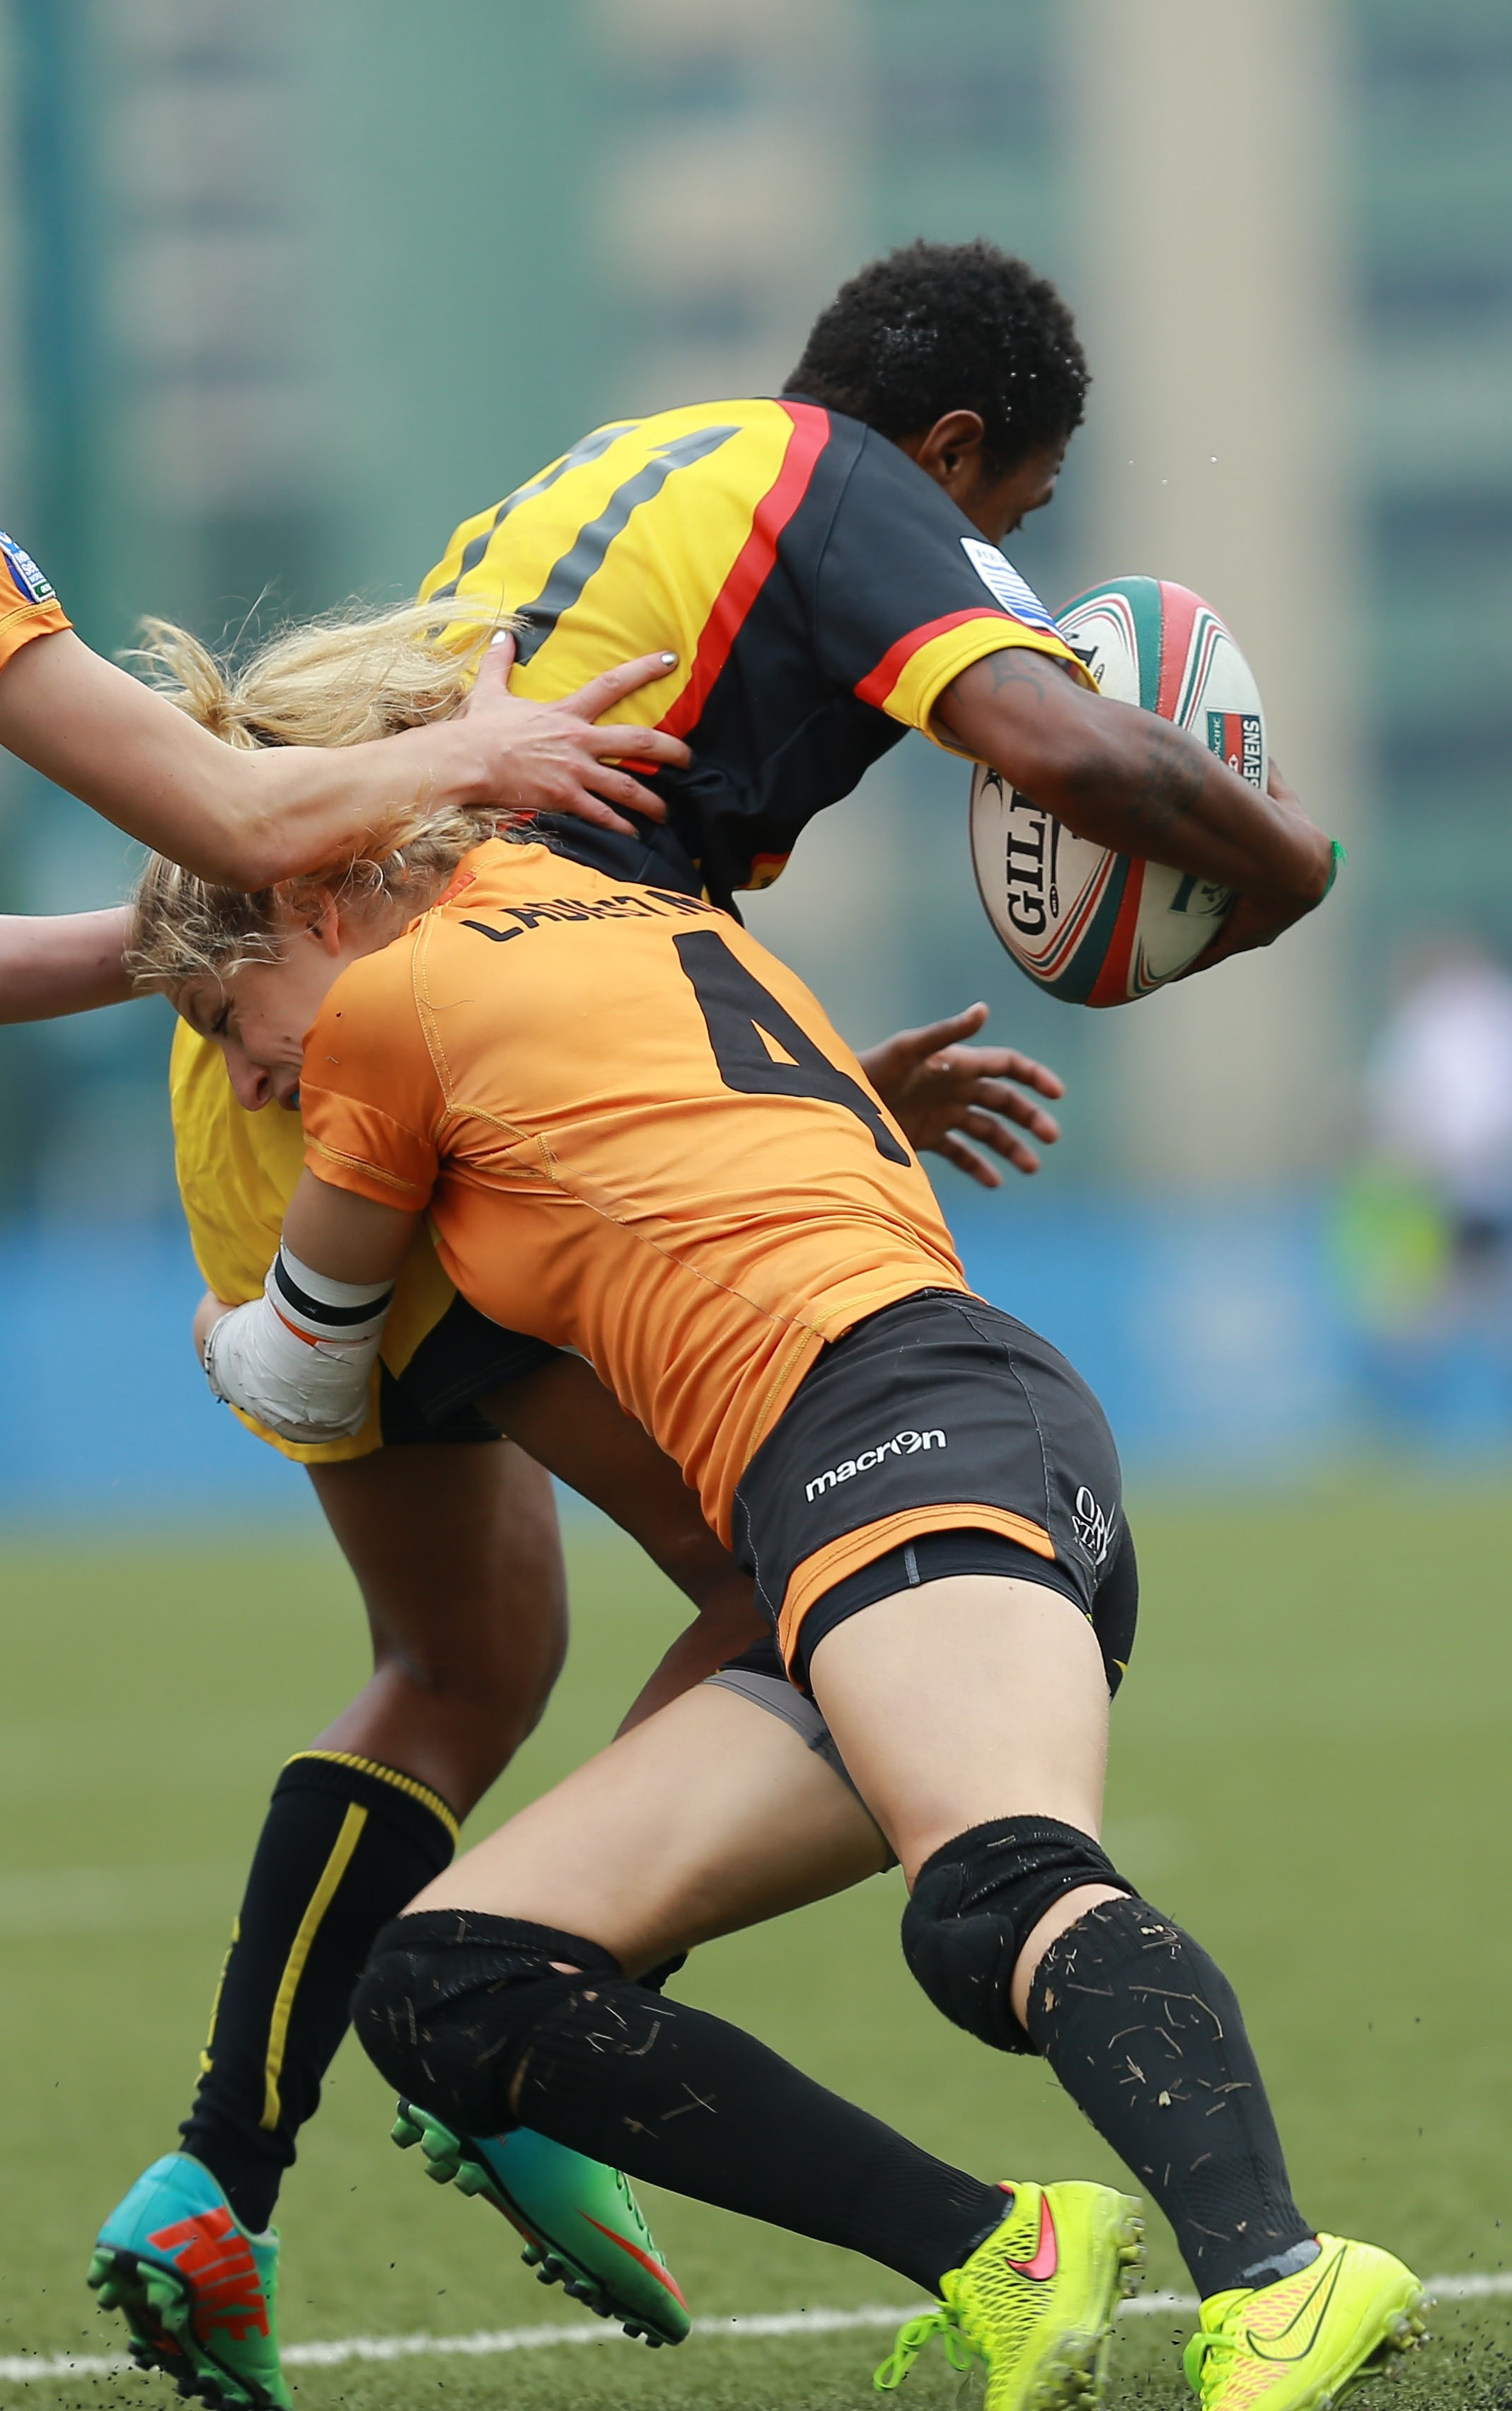 Tessa Veldhuis - Rugby Sevens International